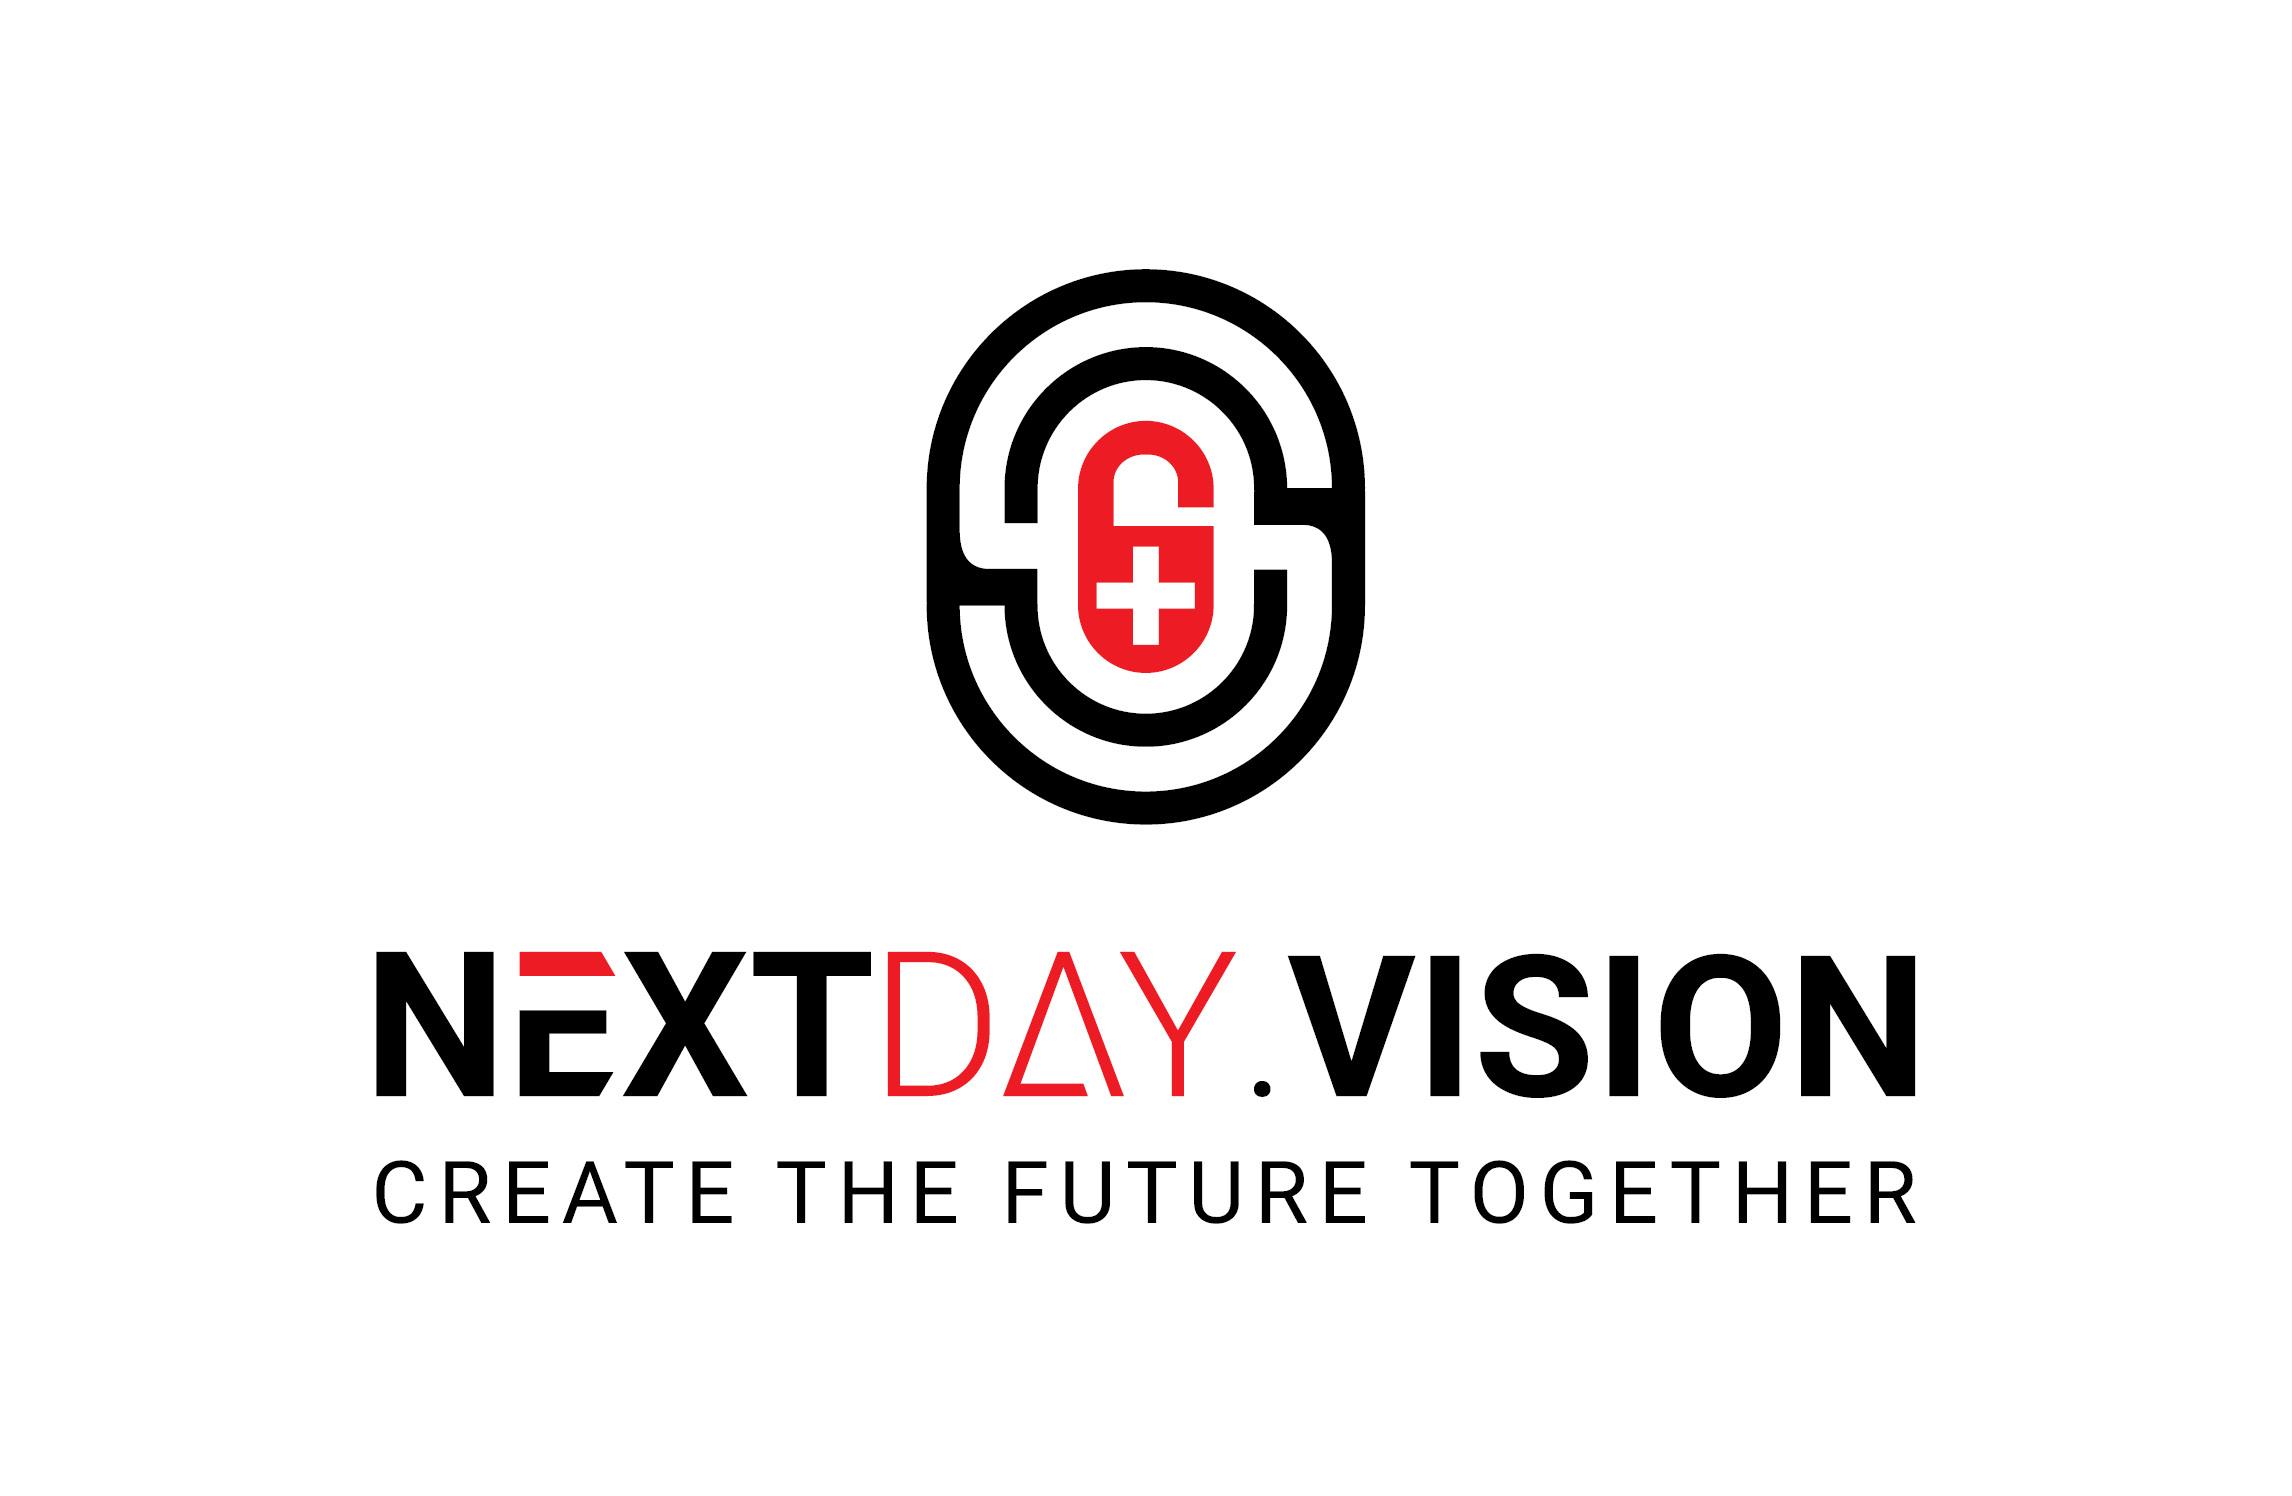 NextDay.vision